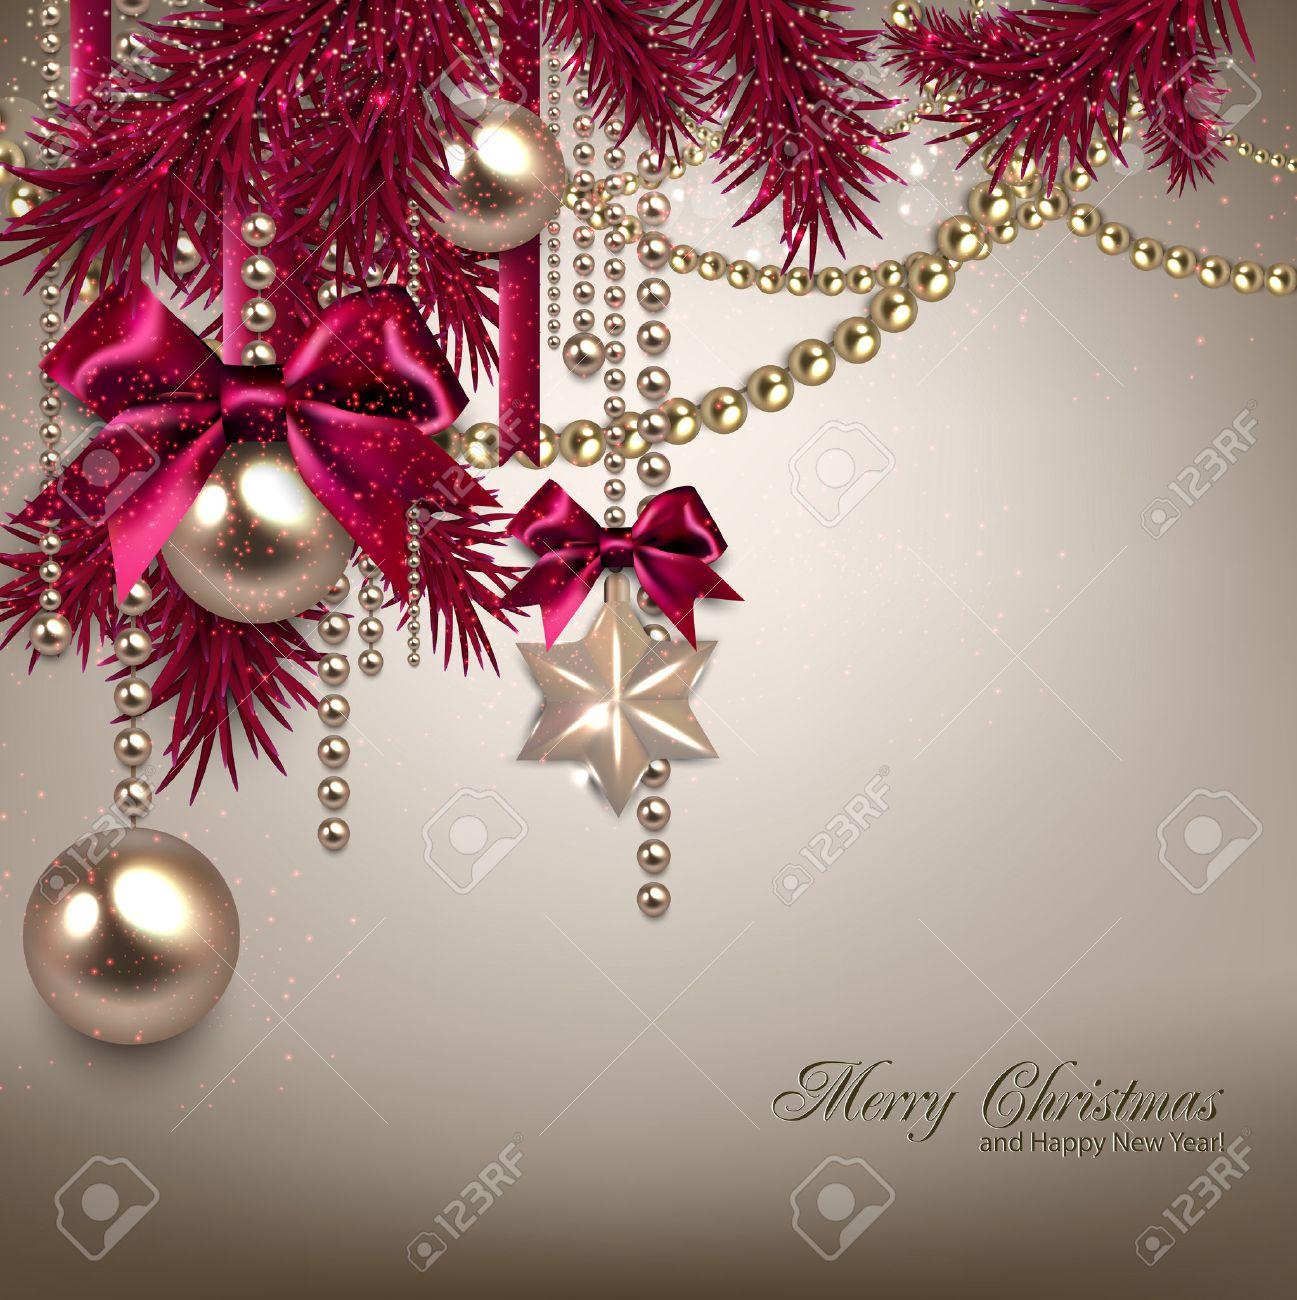 Elegant Christmas Background Hd.Elegant Christmas Background With Golden Garland Vector Illustration